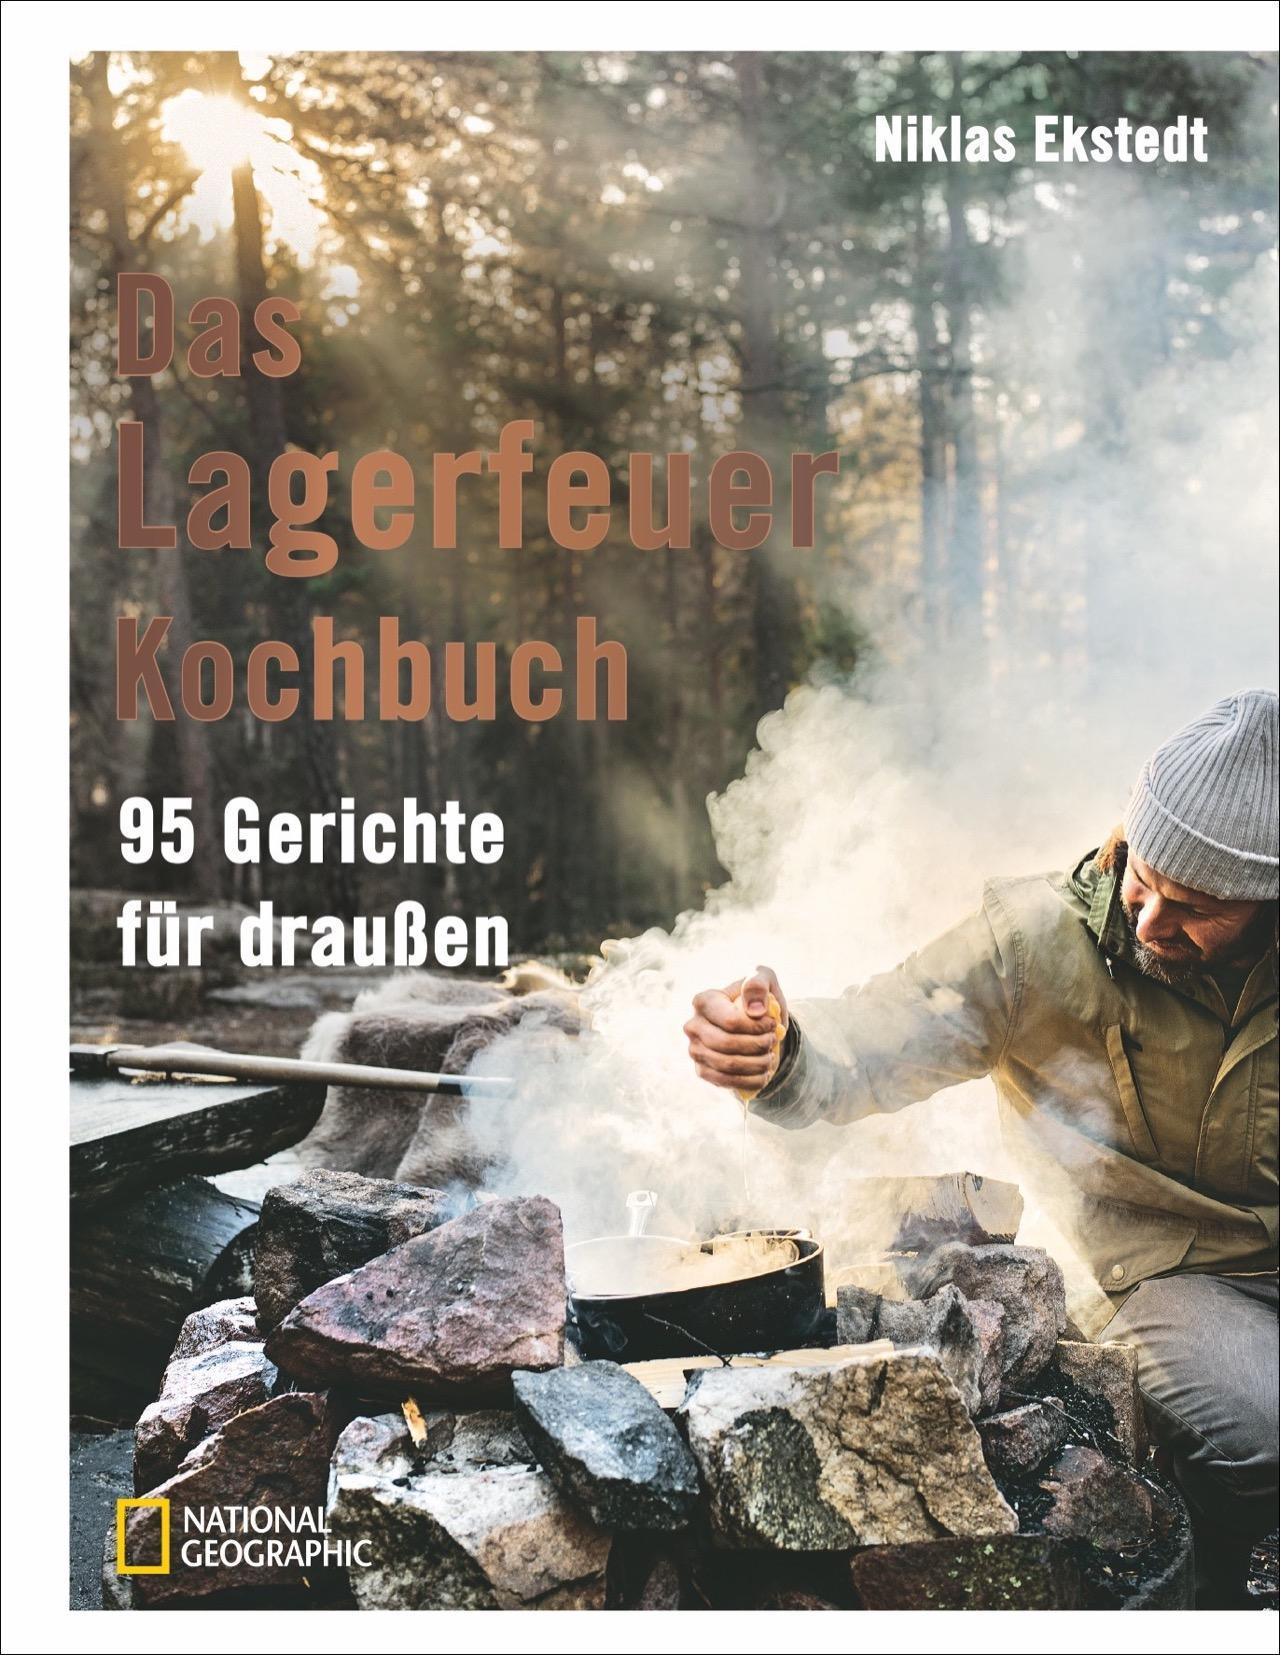 Das-Lagerfeuer-Kochbuch-Niklas-Ekstedt